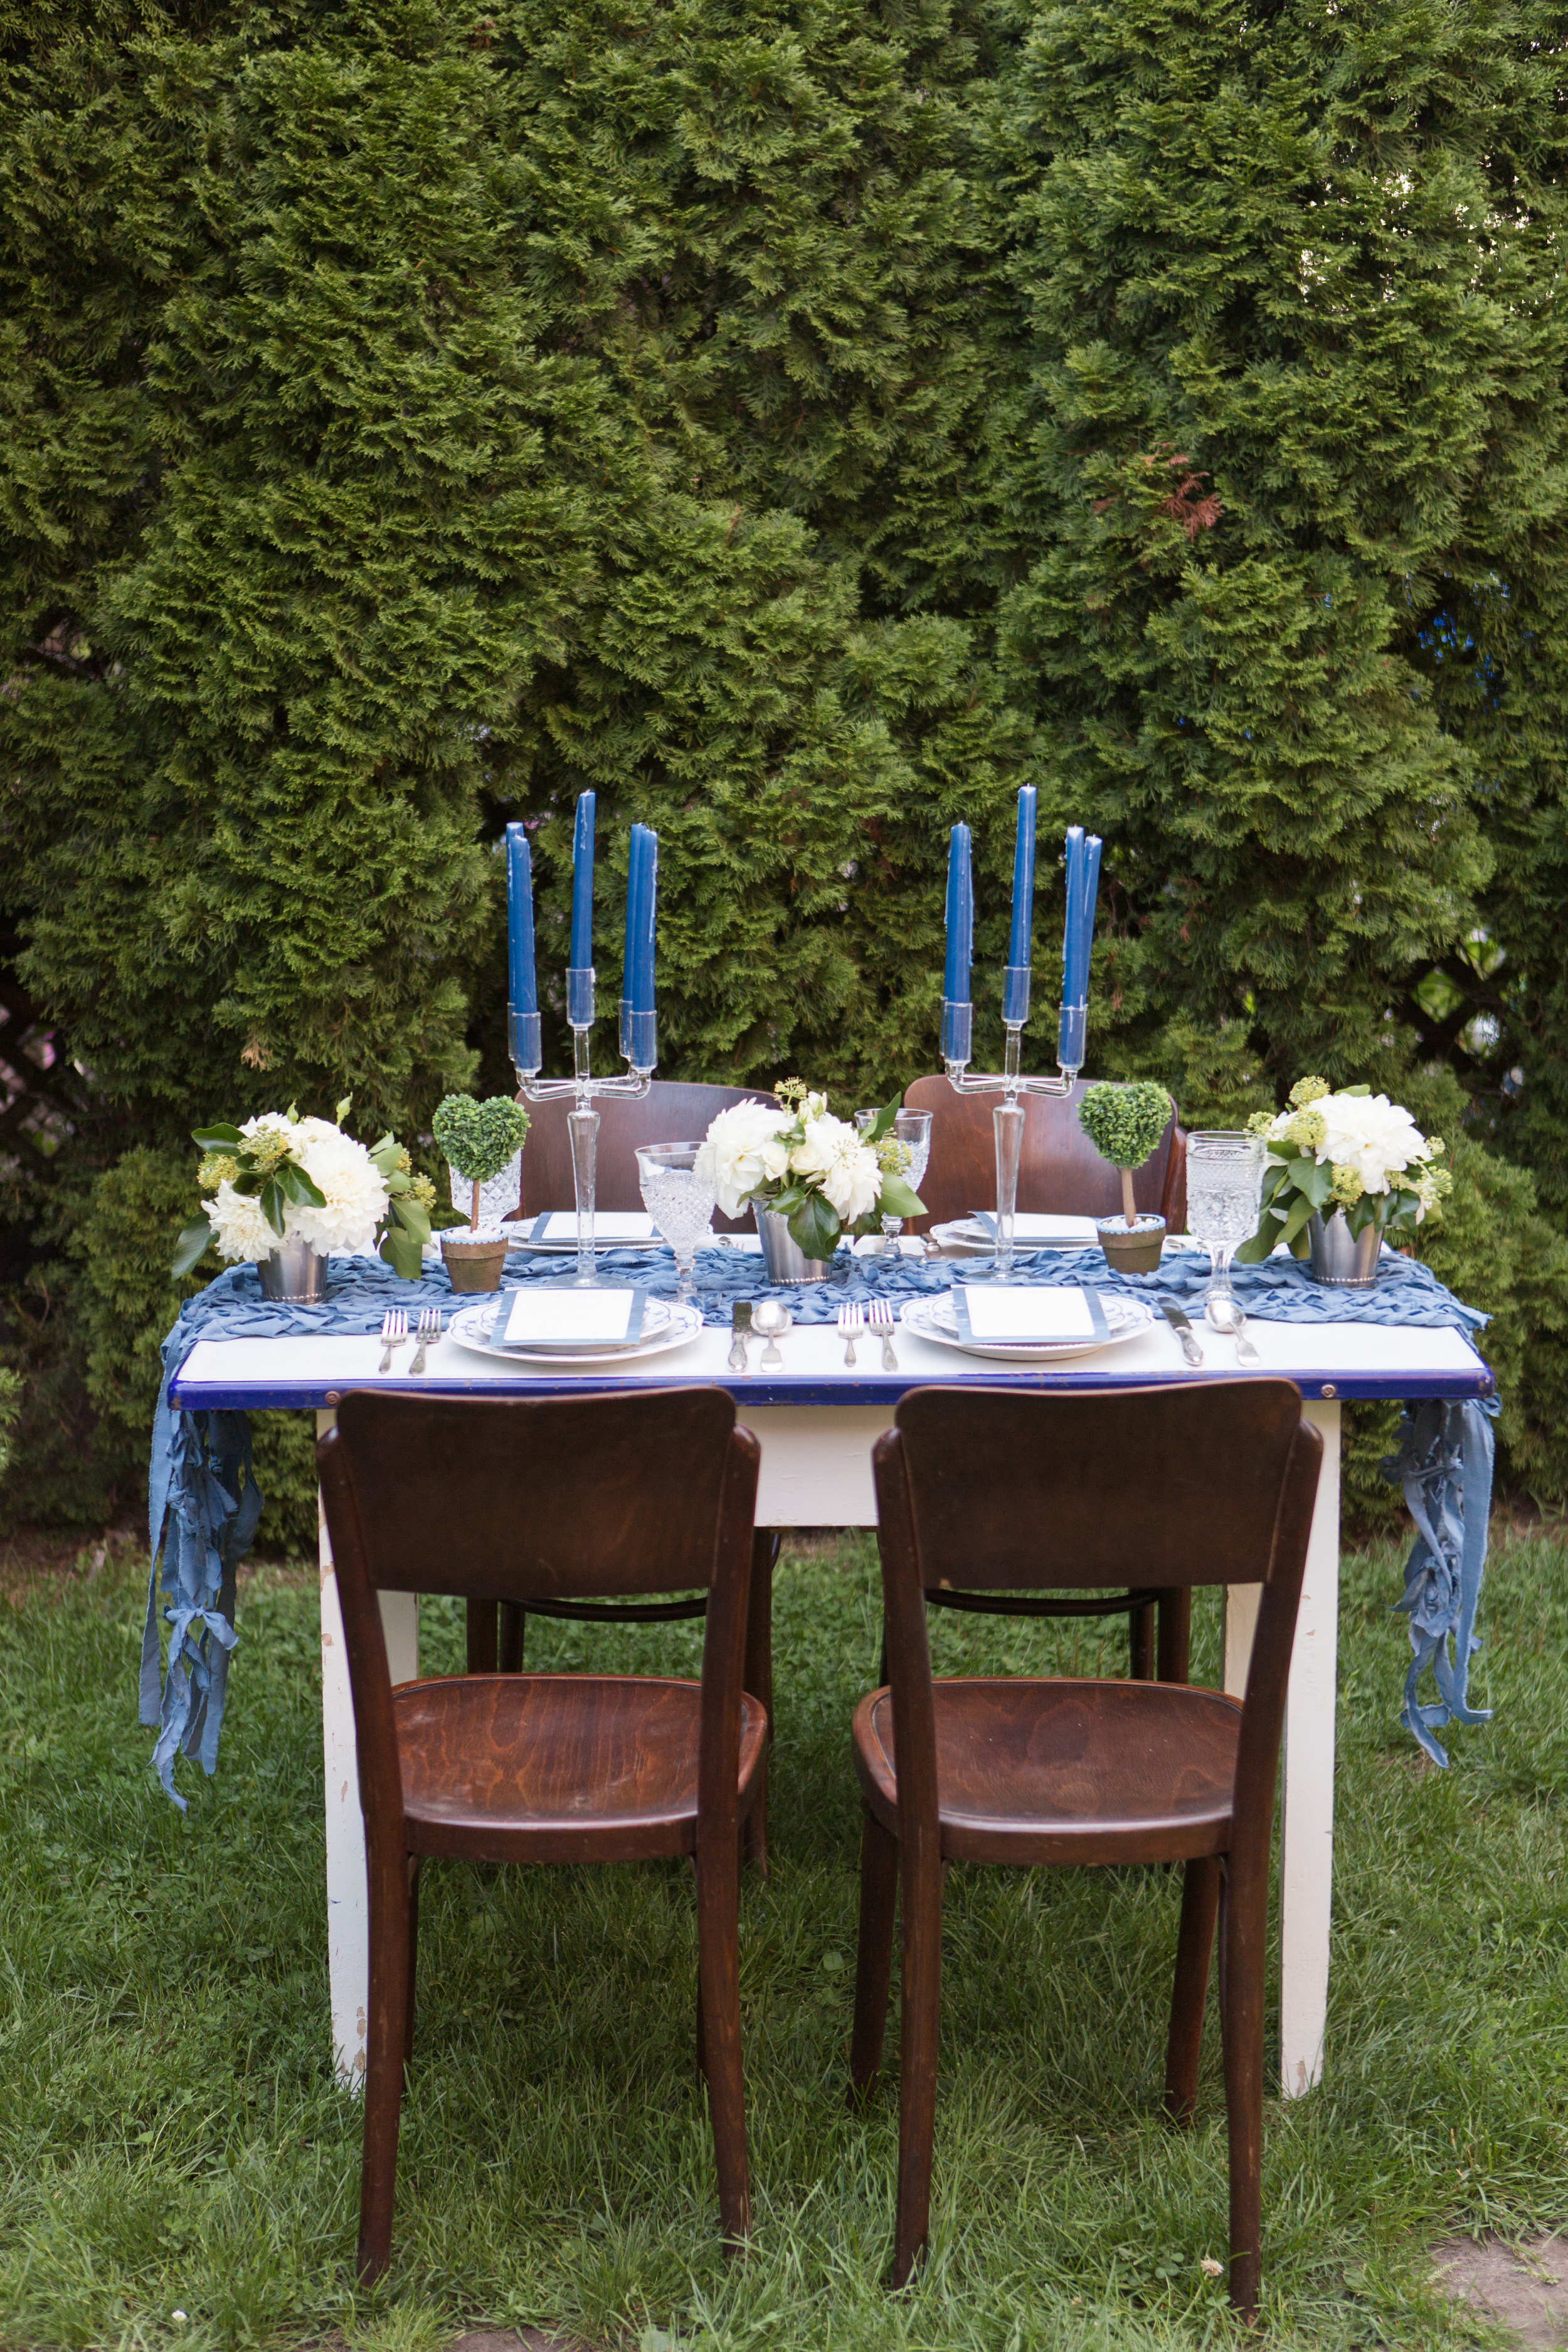 hannah_shih_hanaluluco_cj_isaac_charlie_juliet_ombre_chambray_prospect_park_brooklyn_wedding_38.jpg